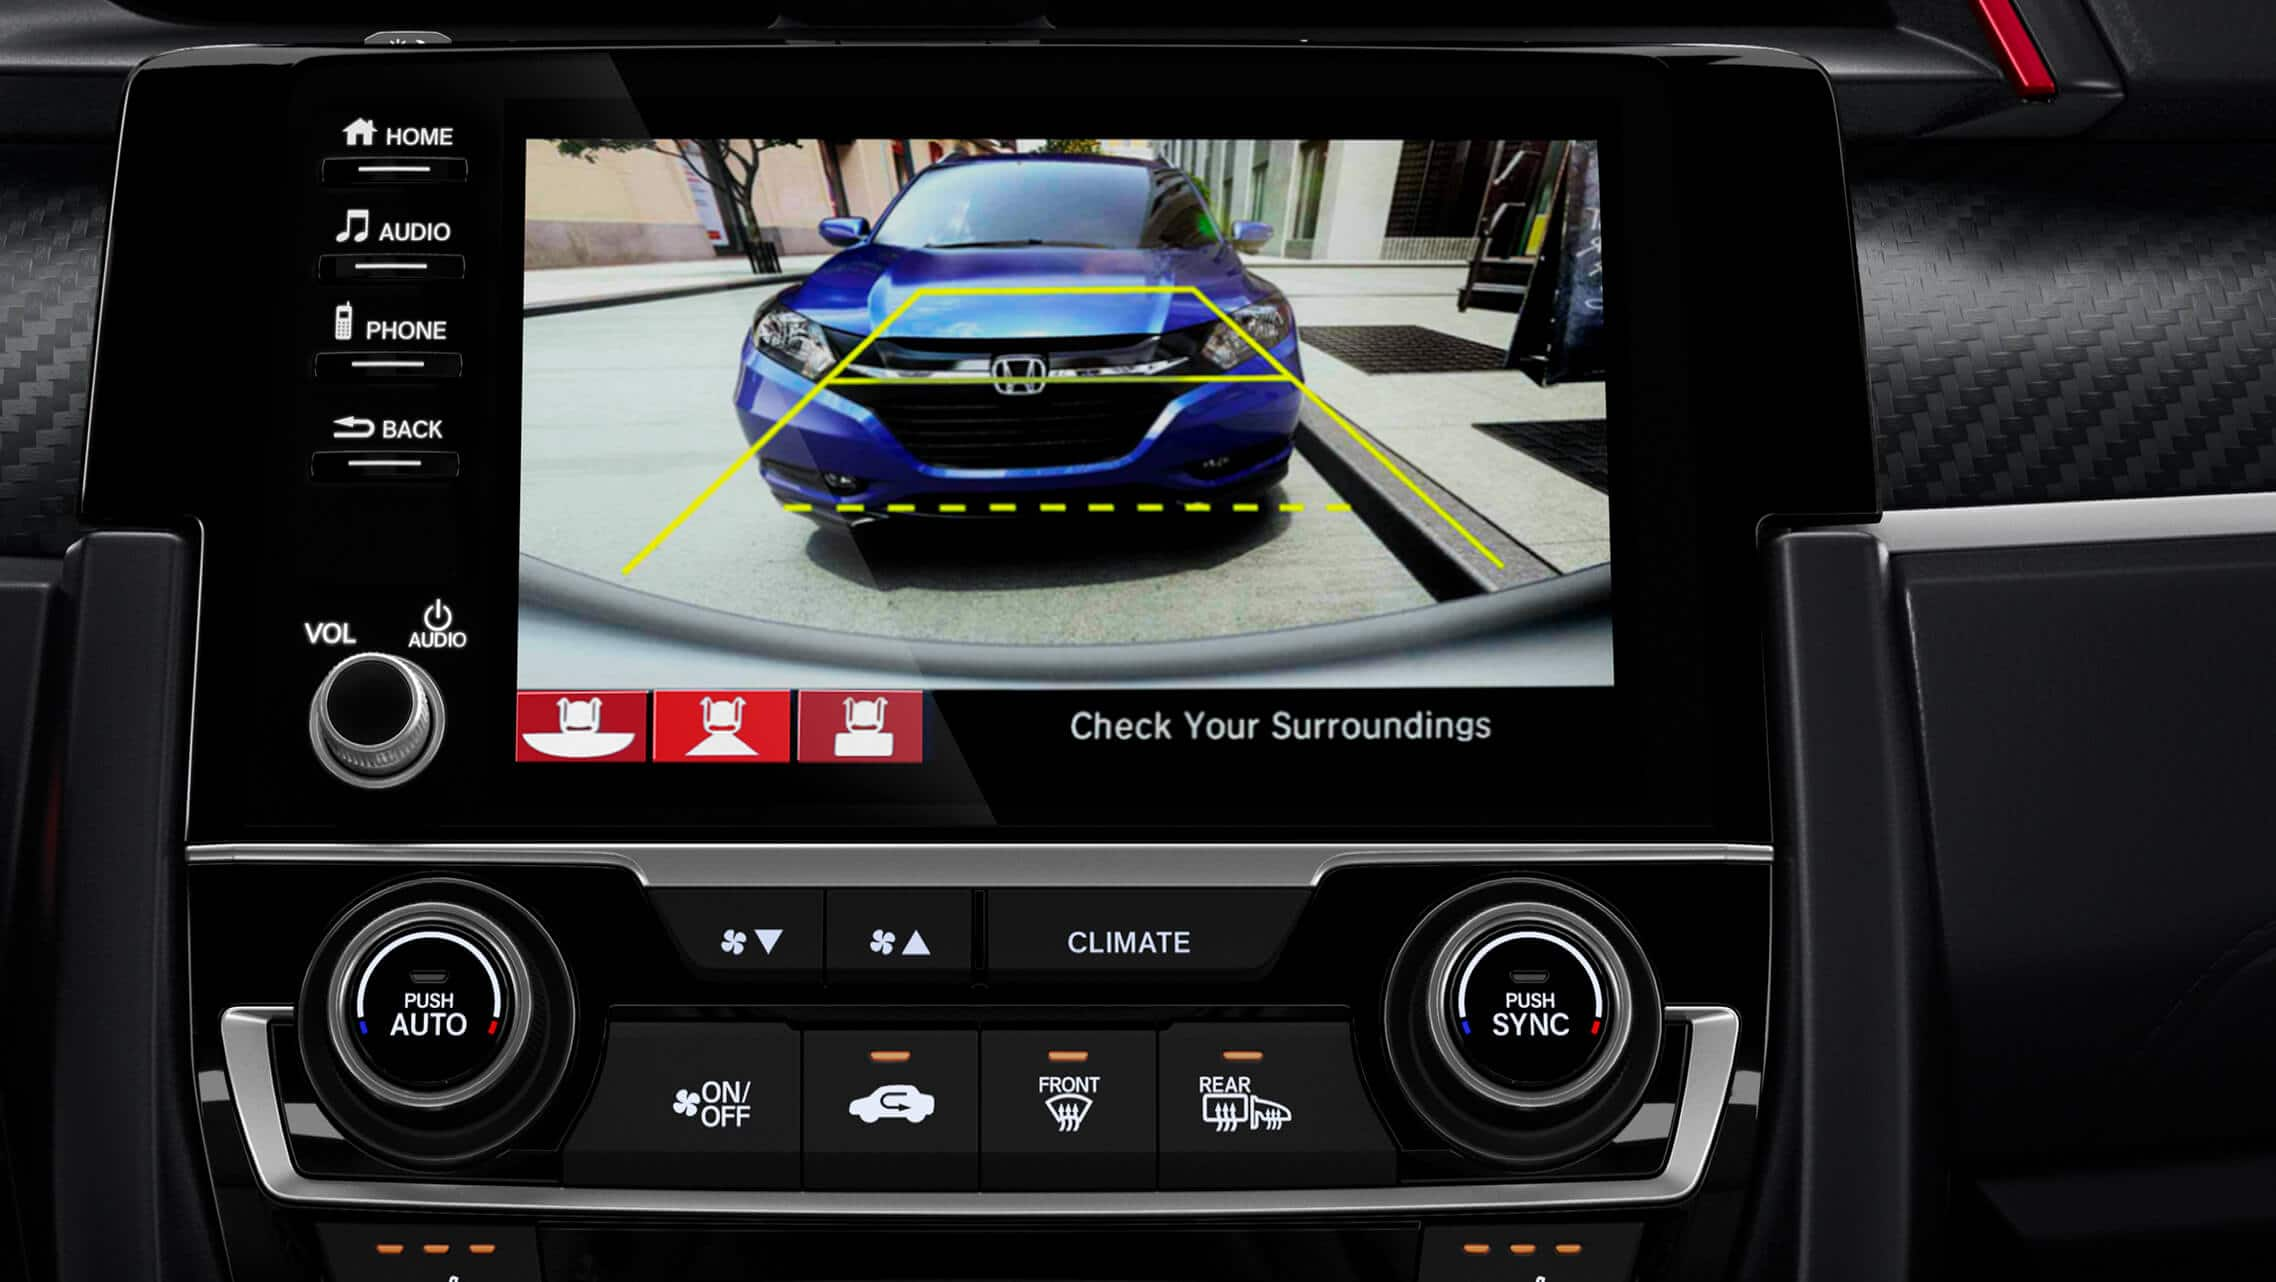 Detalle de la cámara de reversa en la pantalla táctil de 7pulgadas del Honda Civic Si Sedán2020.